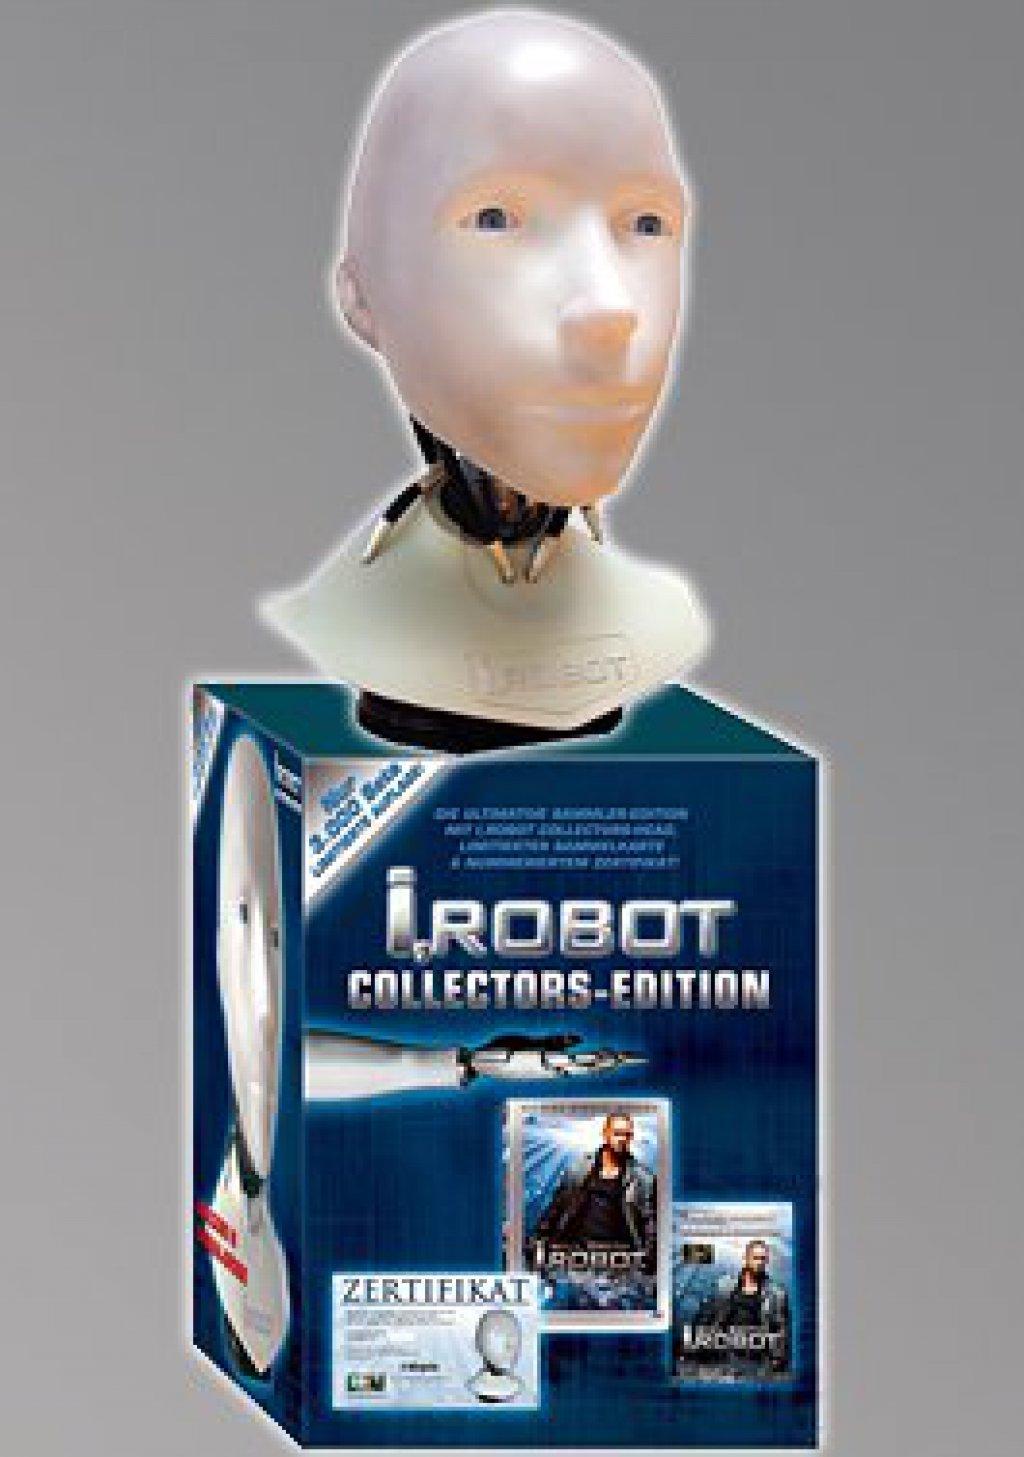 I-Robot-Collector-039-s-Edition-Kunststoff-Robotkopf-1-1-2-DVD-BOX-NEU